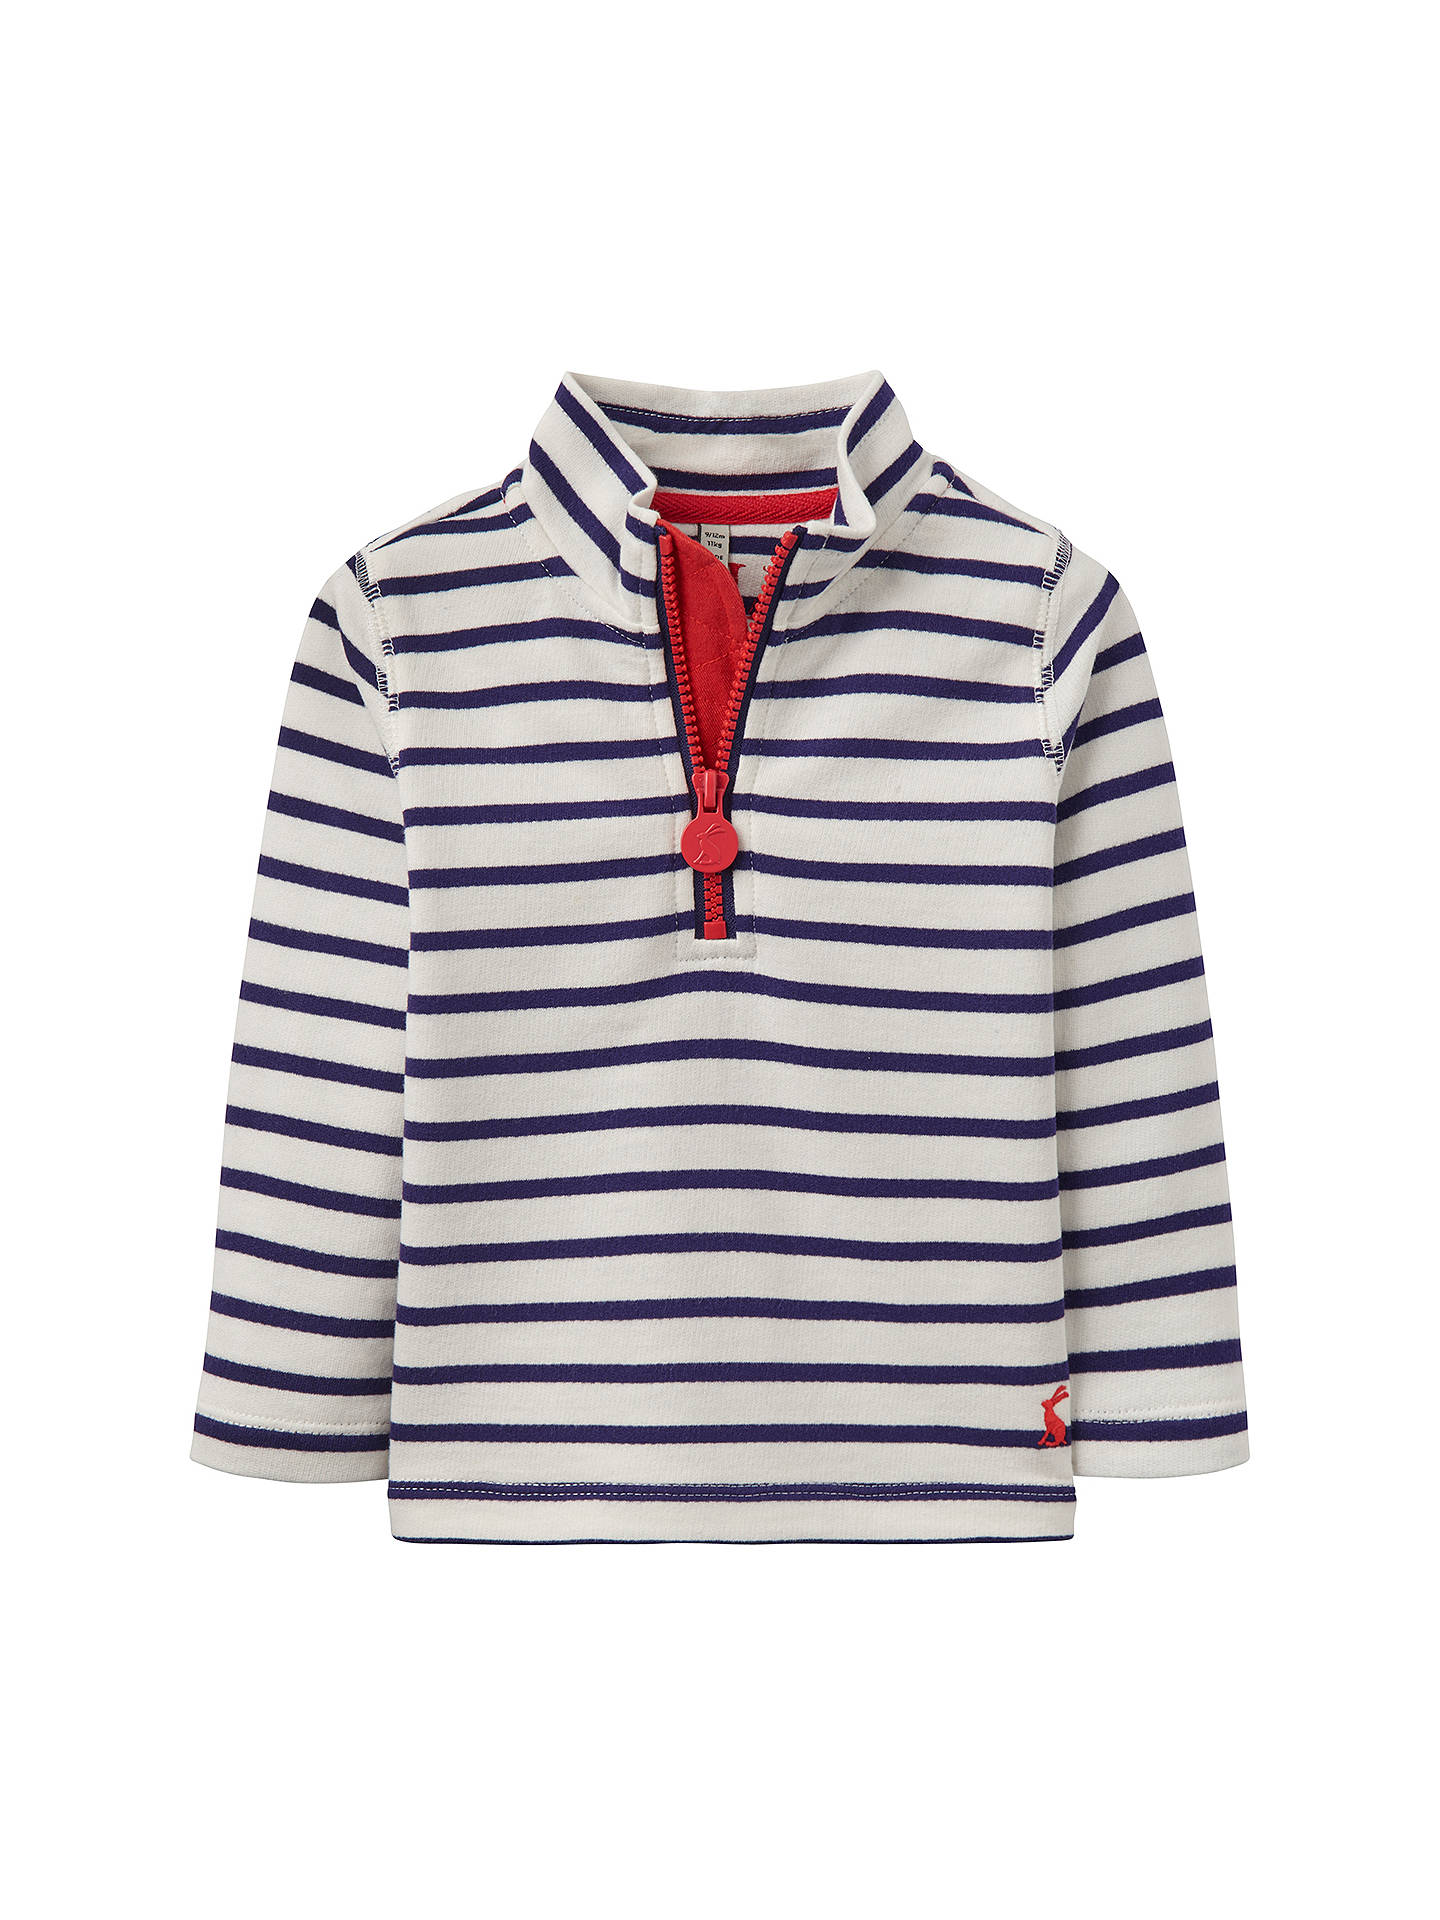 a0303dda471582 BuyBaby Joule Dale Stripe Sweatshirt